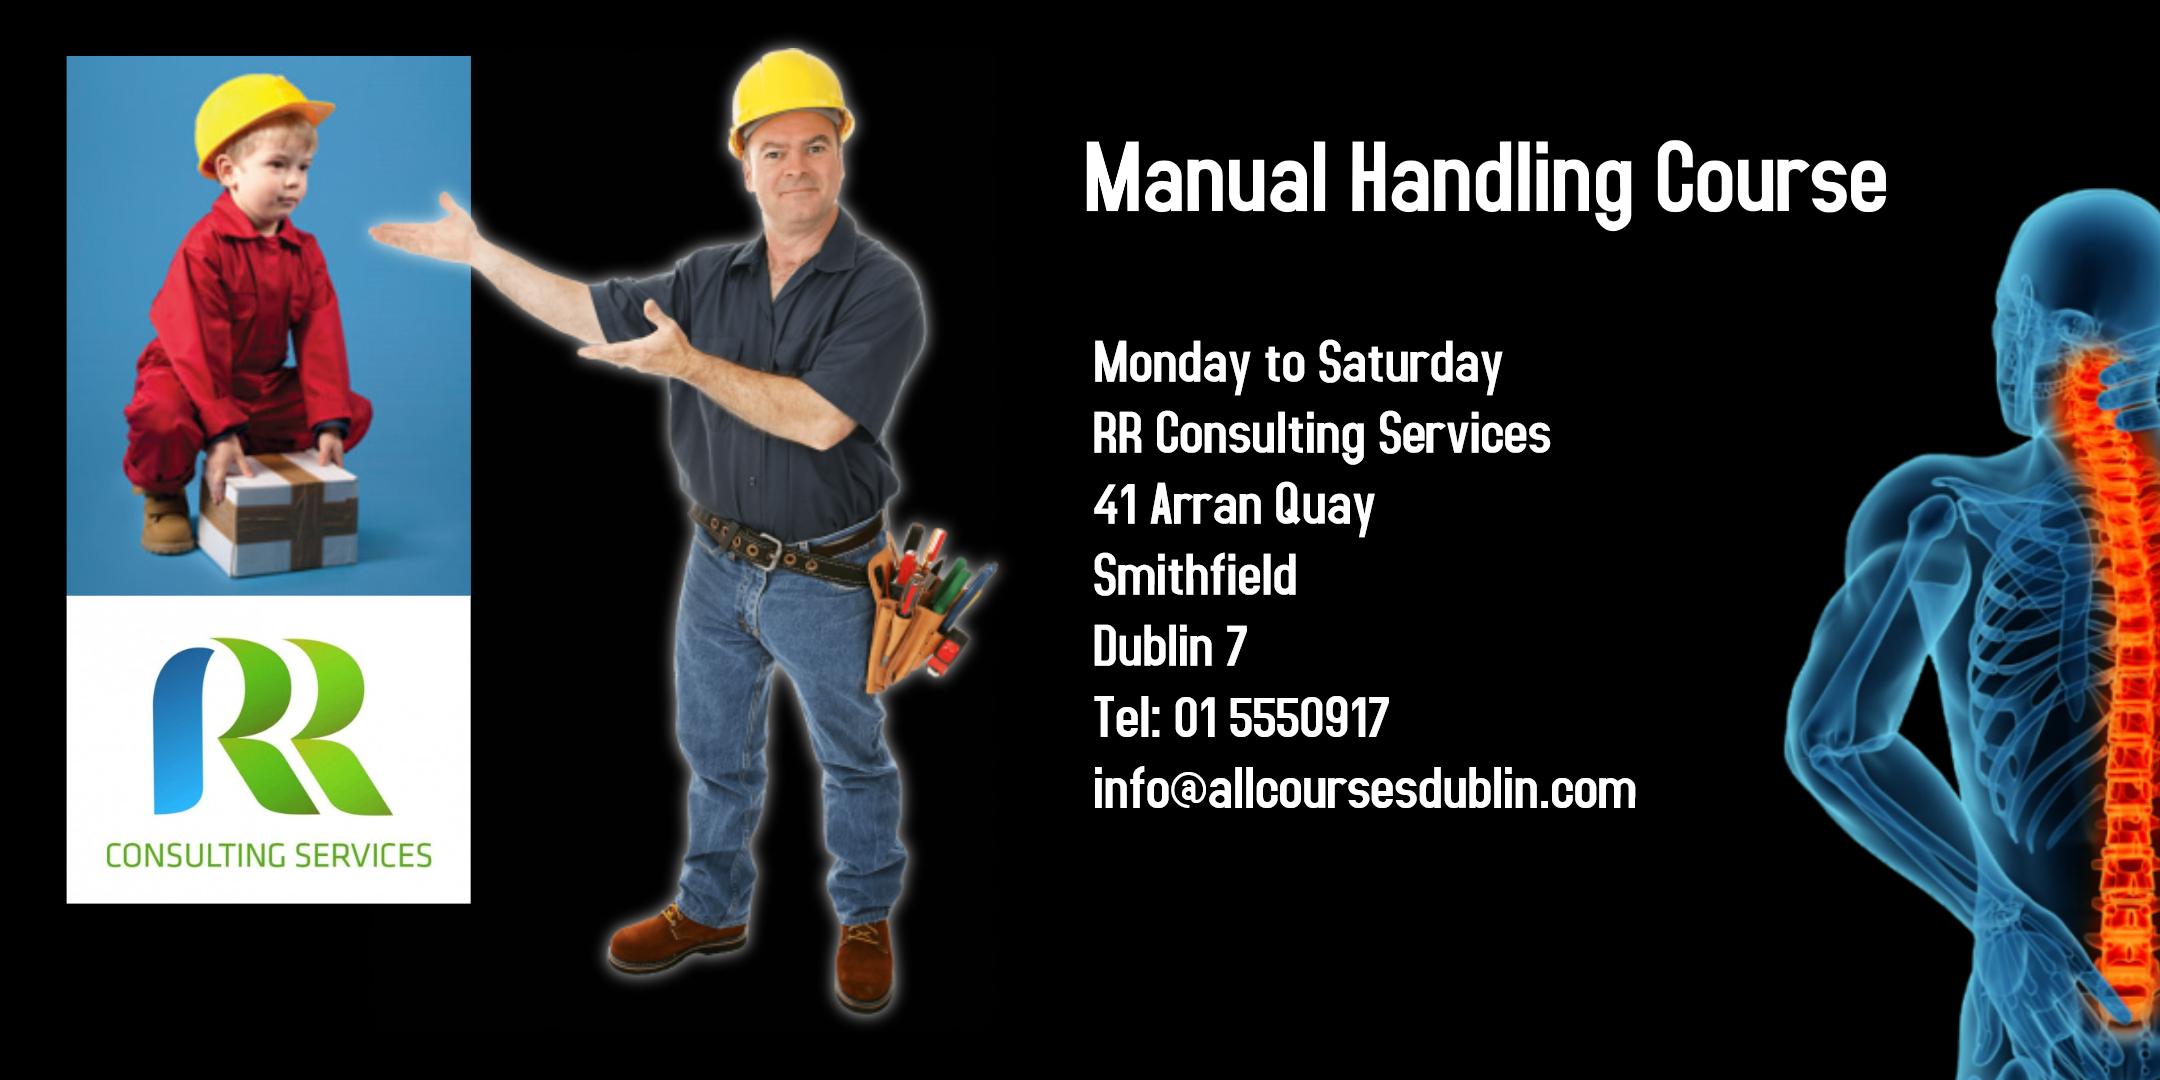 Manual Handling course